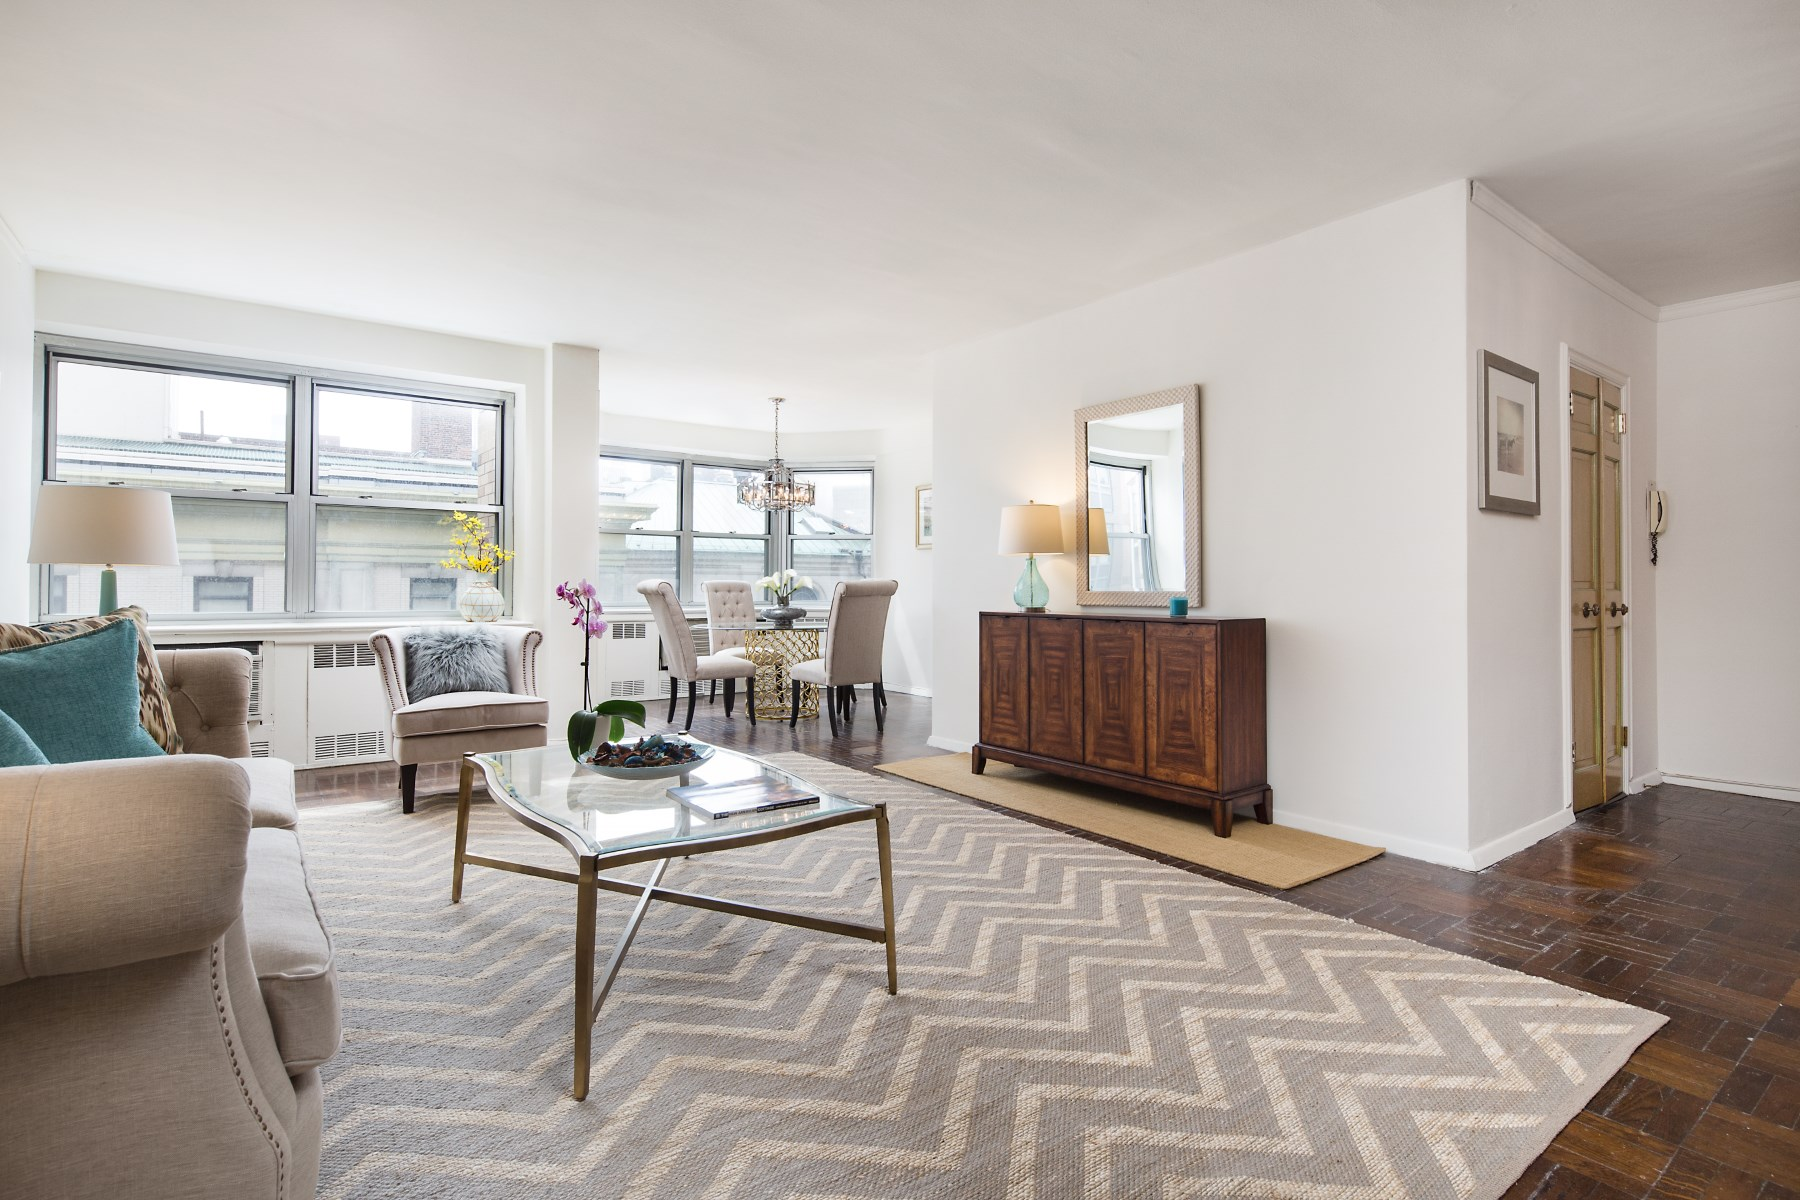 Кооперативная квартира для того Продажа на Opportunity Awaits 155 East 76th Street Apt 8E Upper East Side, New York, Нью-Йорк, 10021 Соединенные Штаты